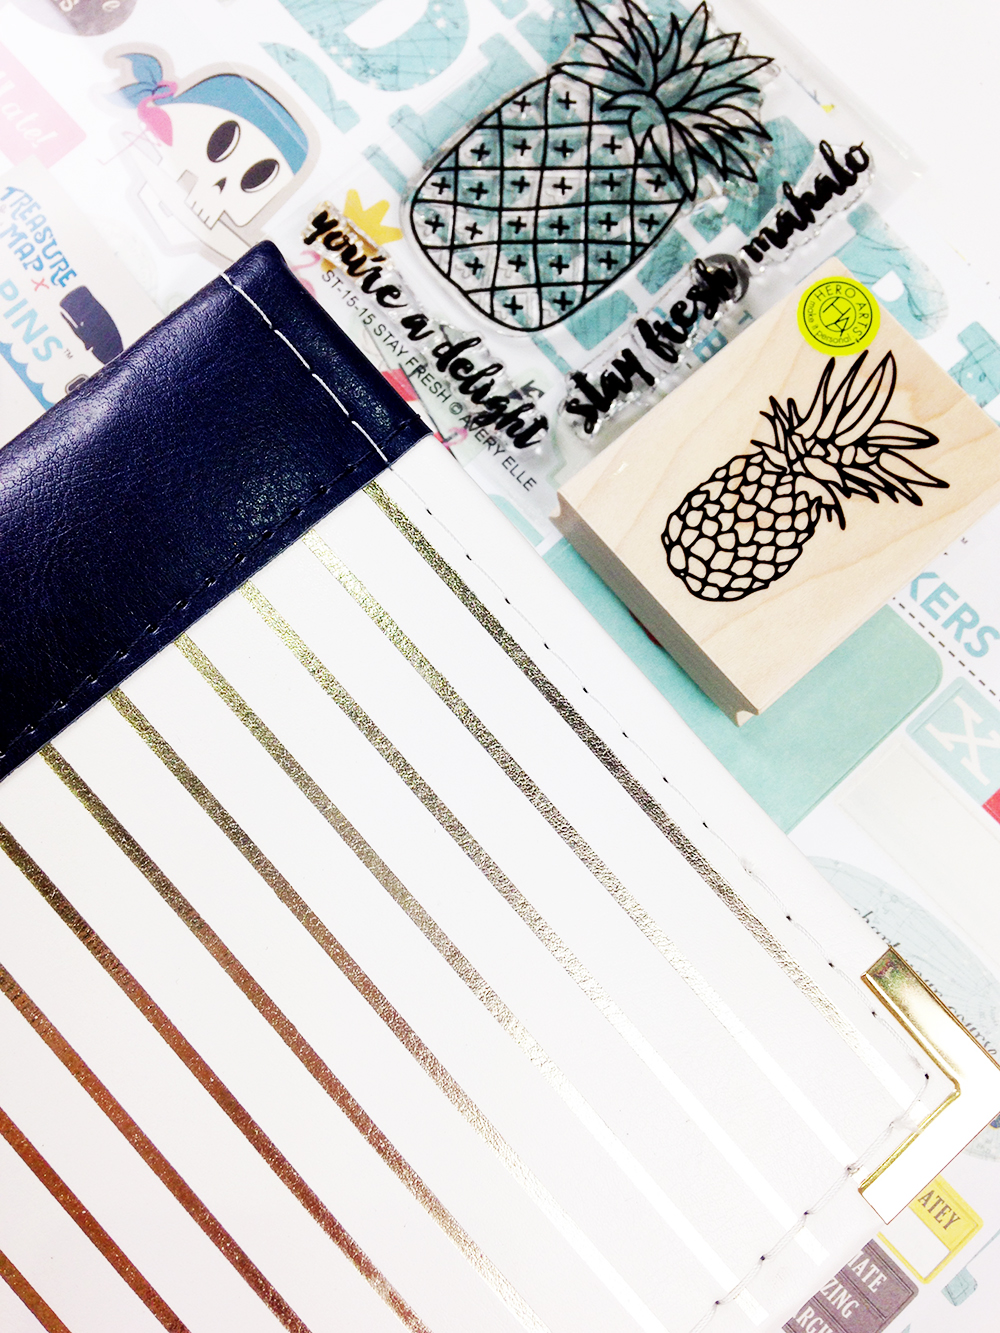 A peek at September Mini Book supplies...